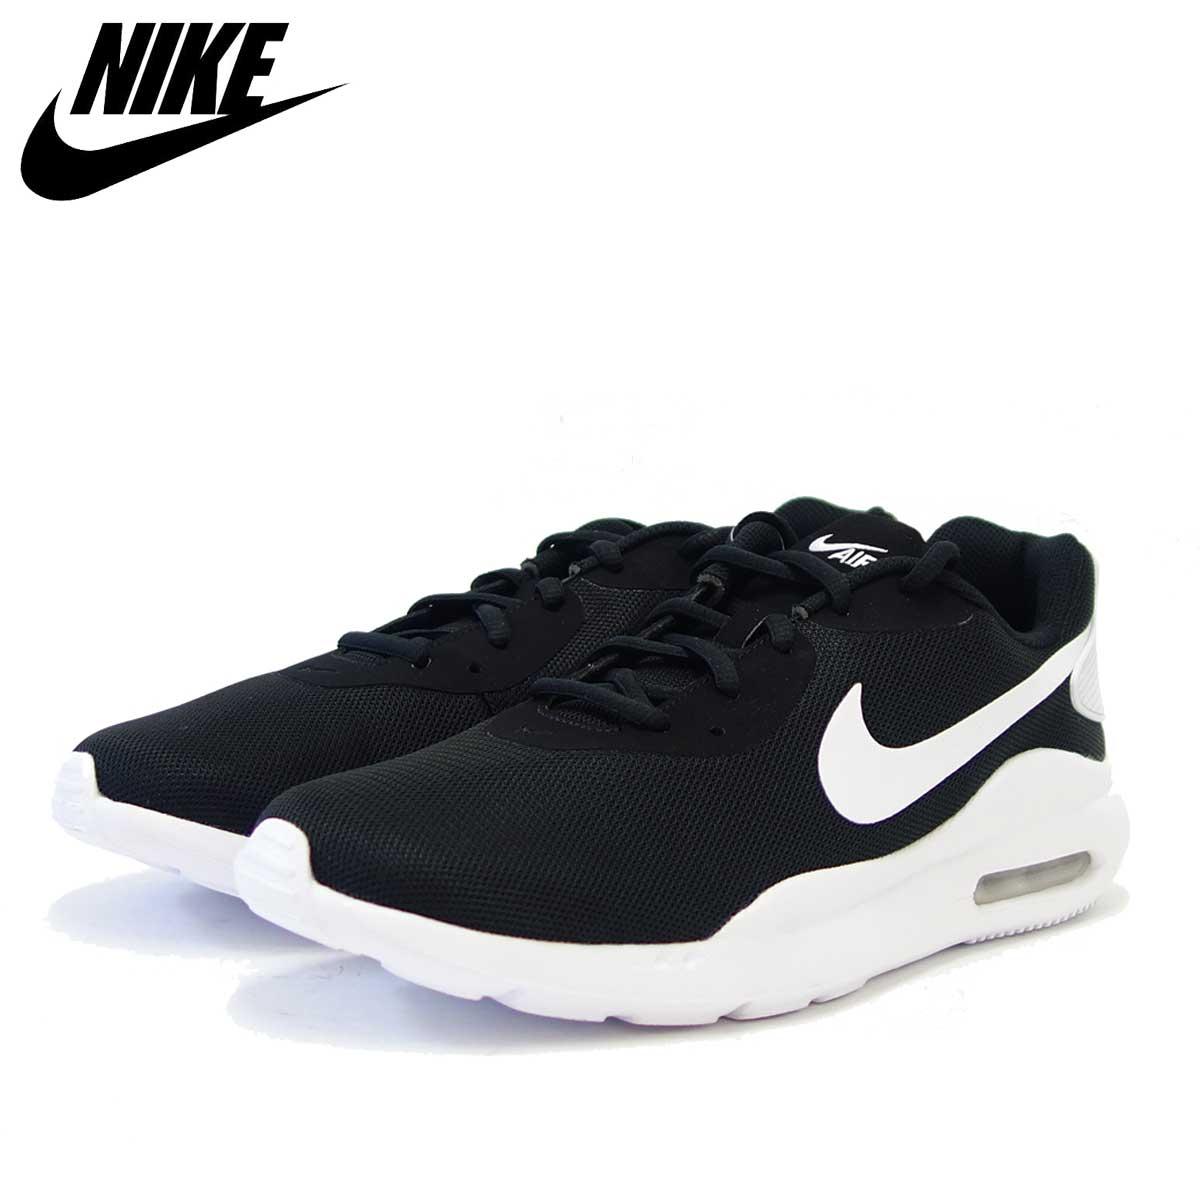 factory authentic designer fashion sneakers for cheap NIKE ナイキエアマックスオケト AQ2235 002 black / white (men's) NIKE AIR MAX OKETO